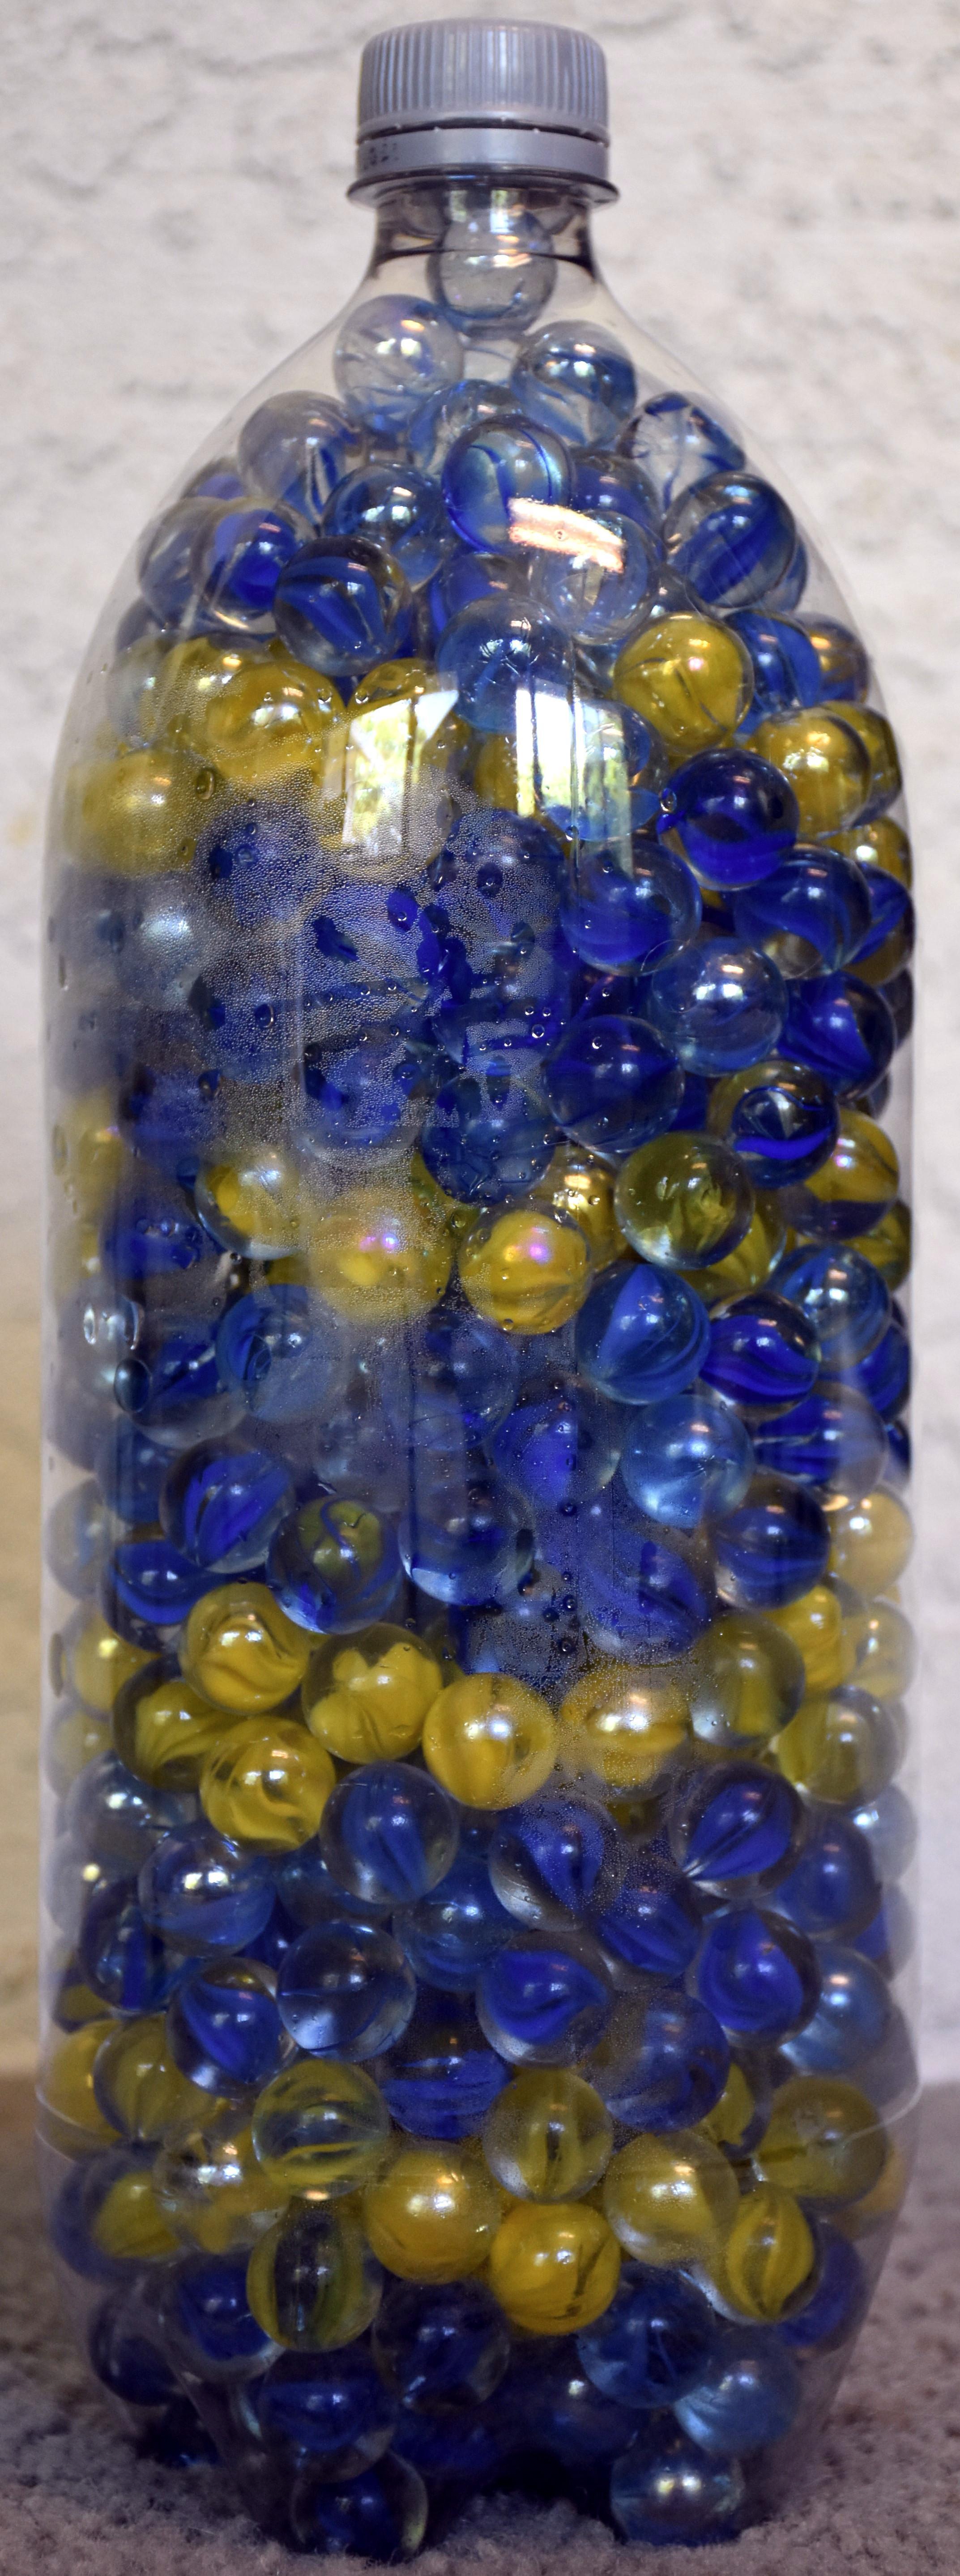 Bottle of Marbles